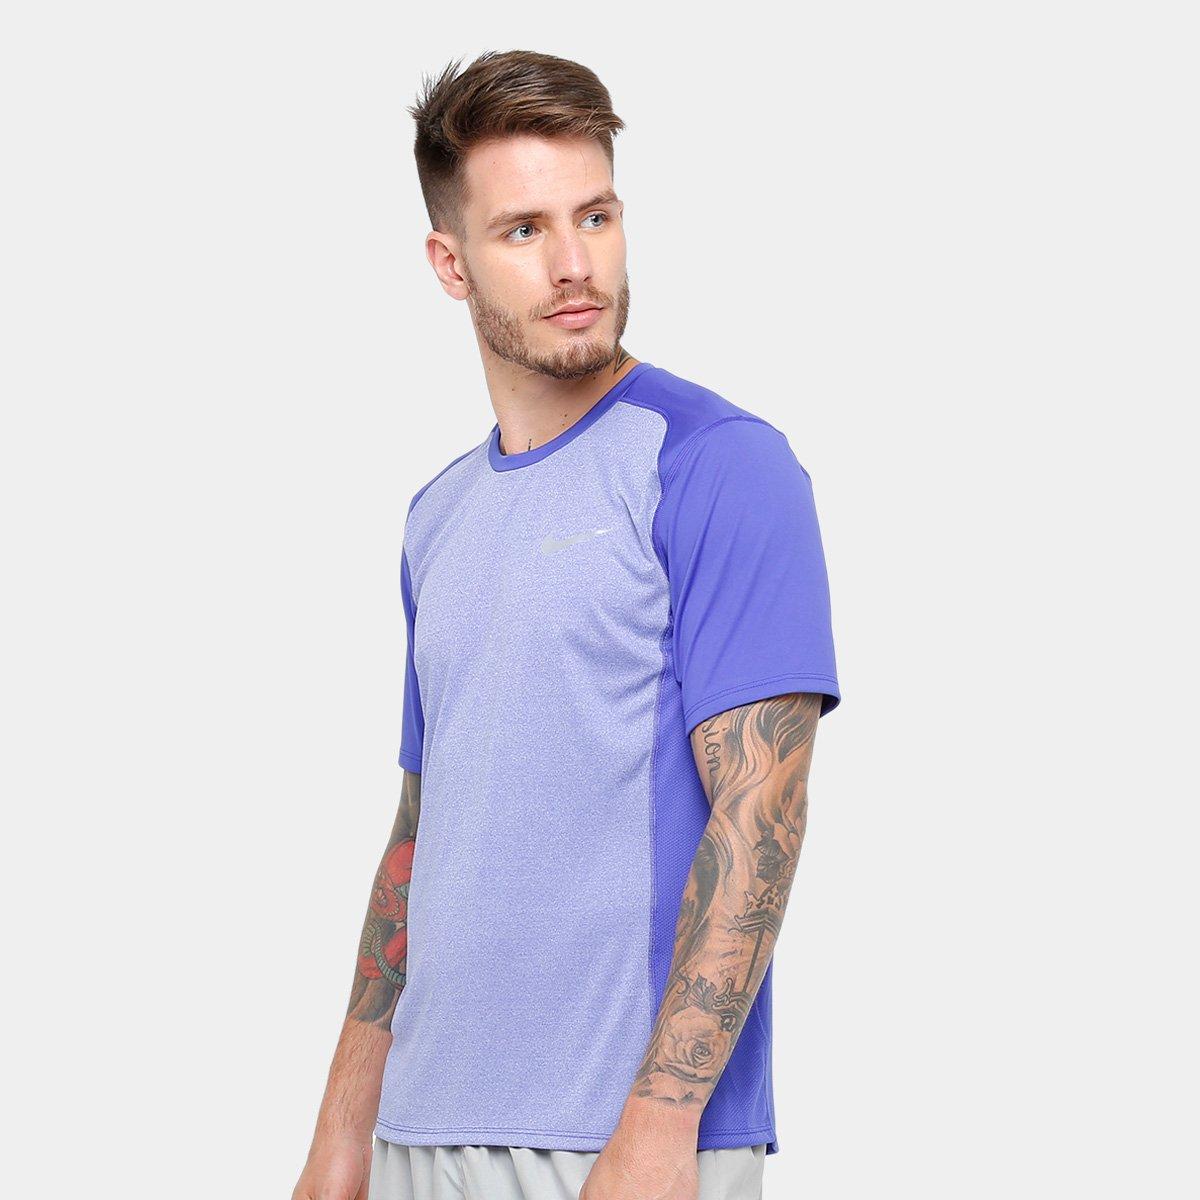 3853bd8181e29 Camiseta Nike Dri-Fit Miler SS Masculina - Roxo - Compre Agora ...